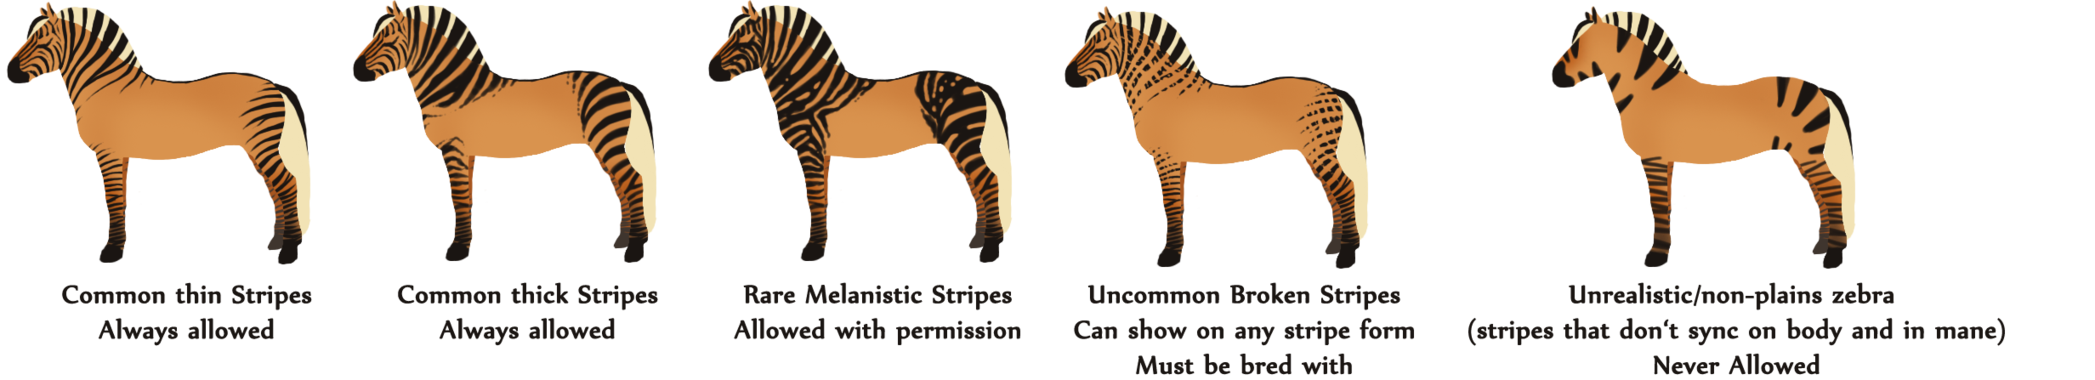 clipart zebra zebra body